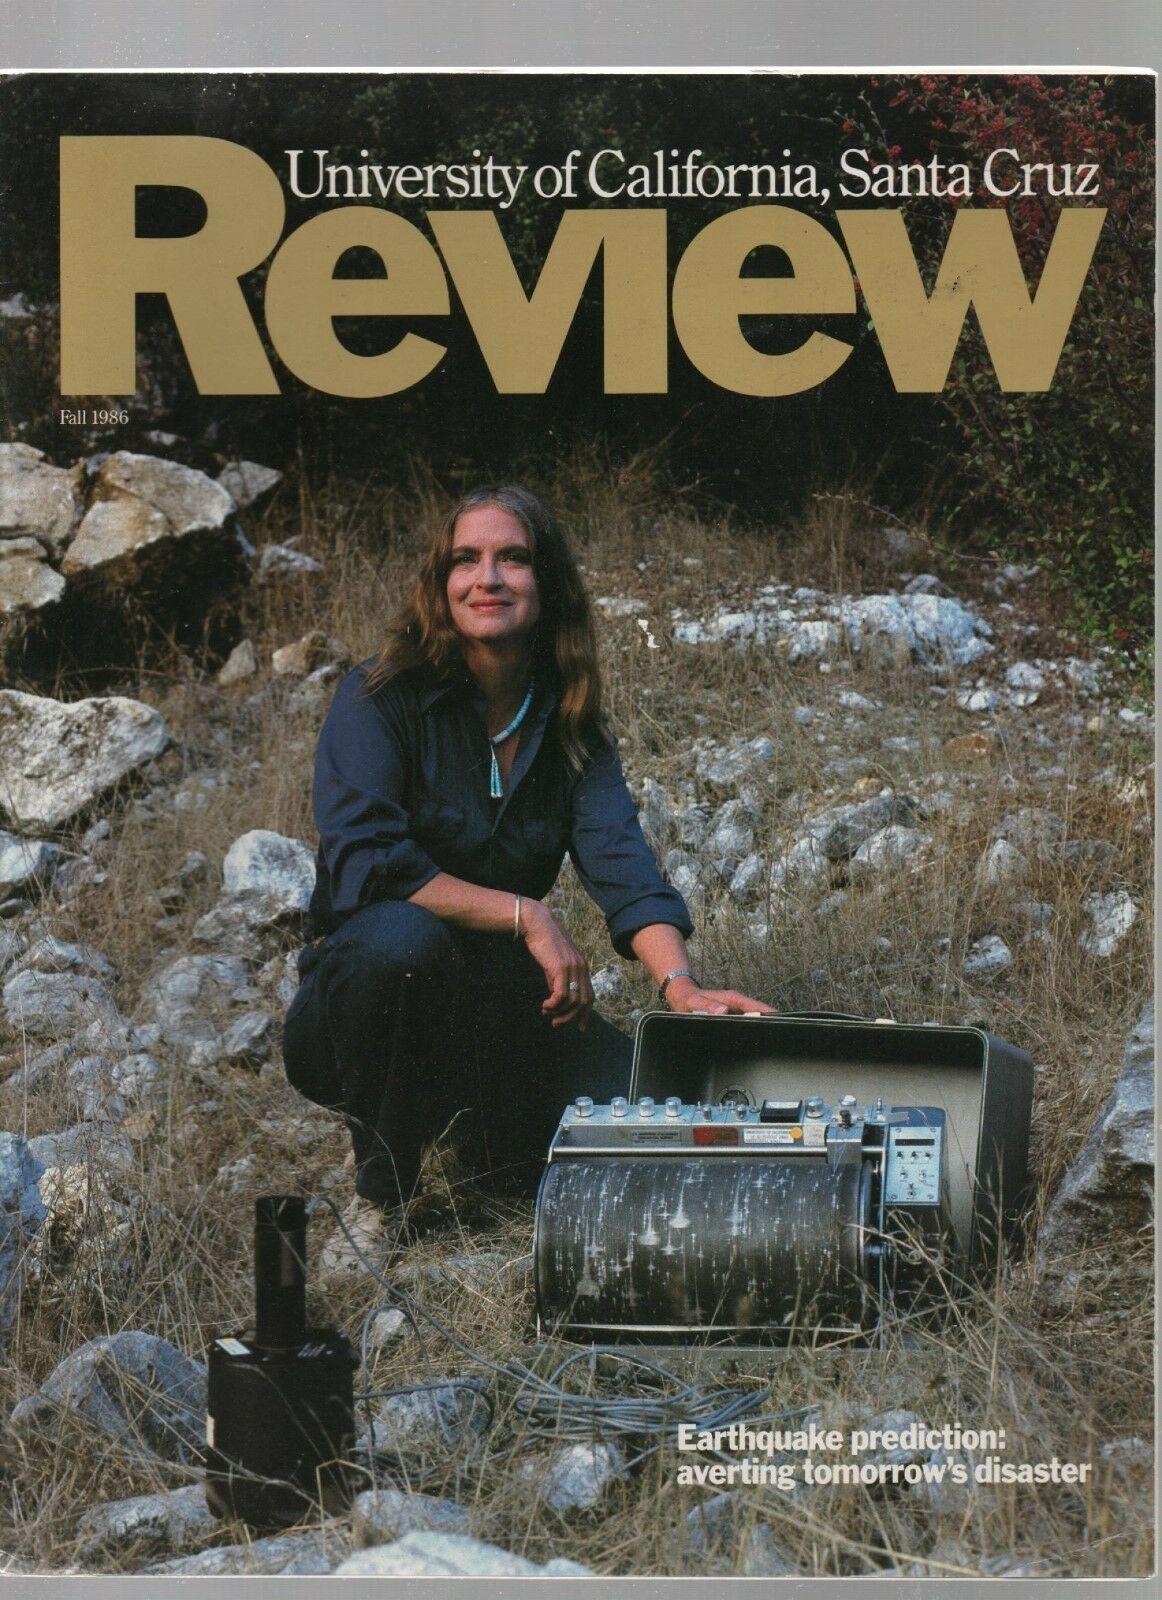 University of California, Santa Cruz Review - Fall 1986 - Earthquake Prediction.